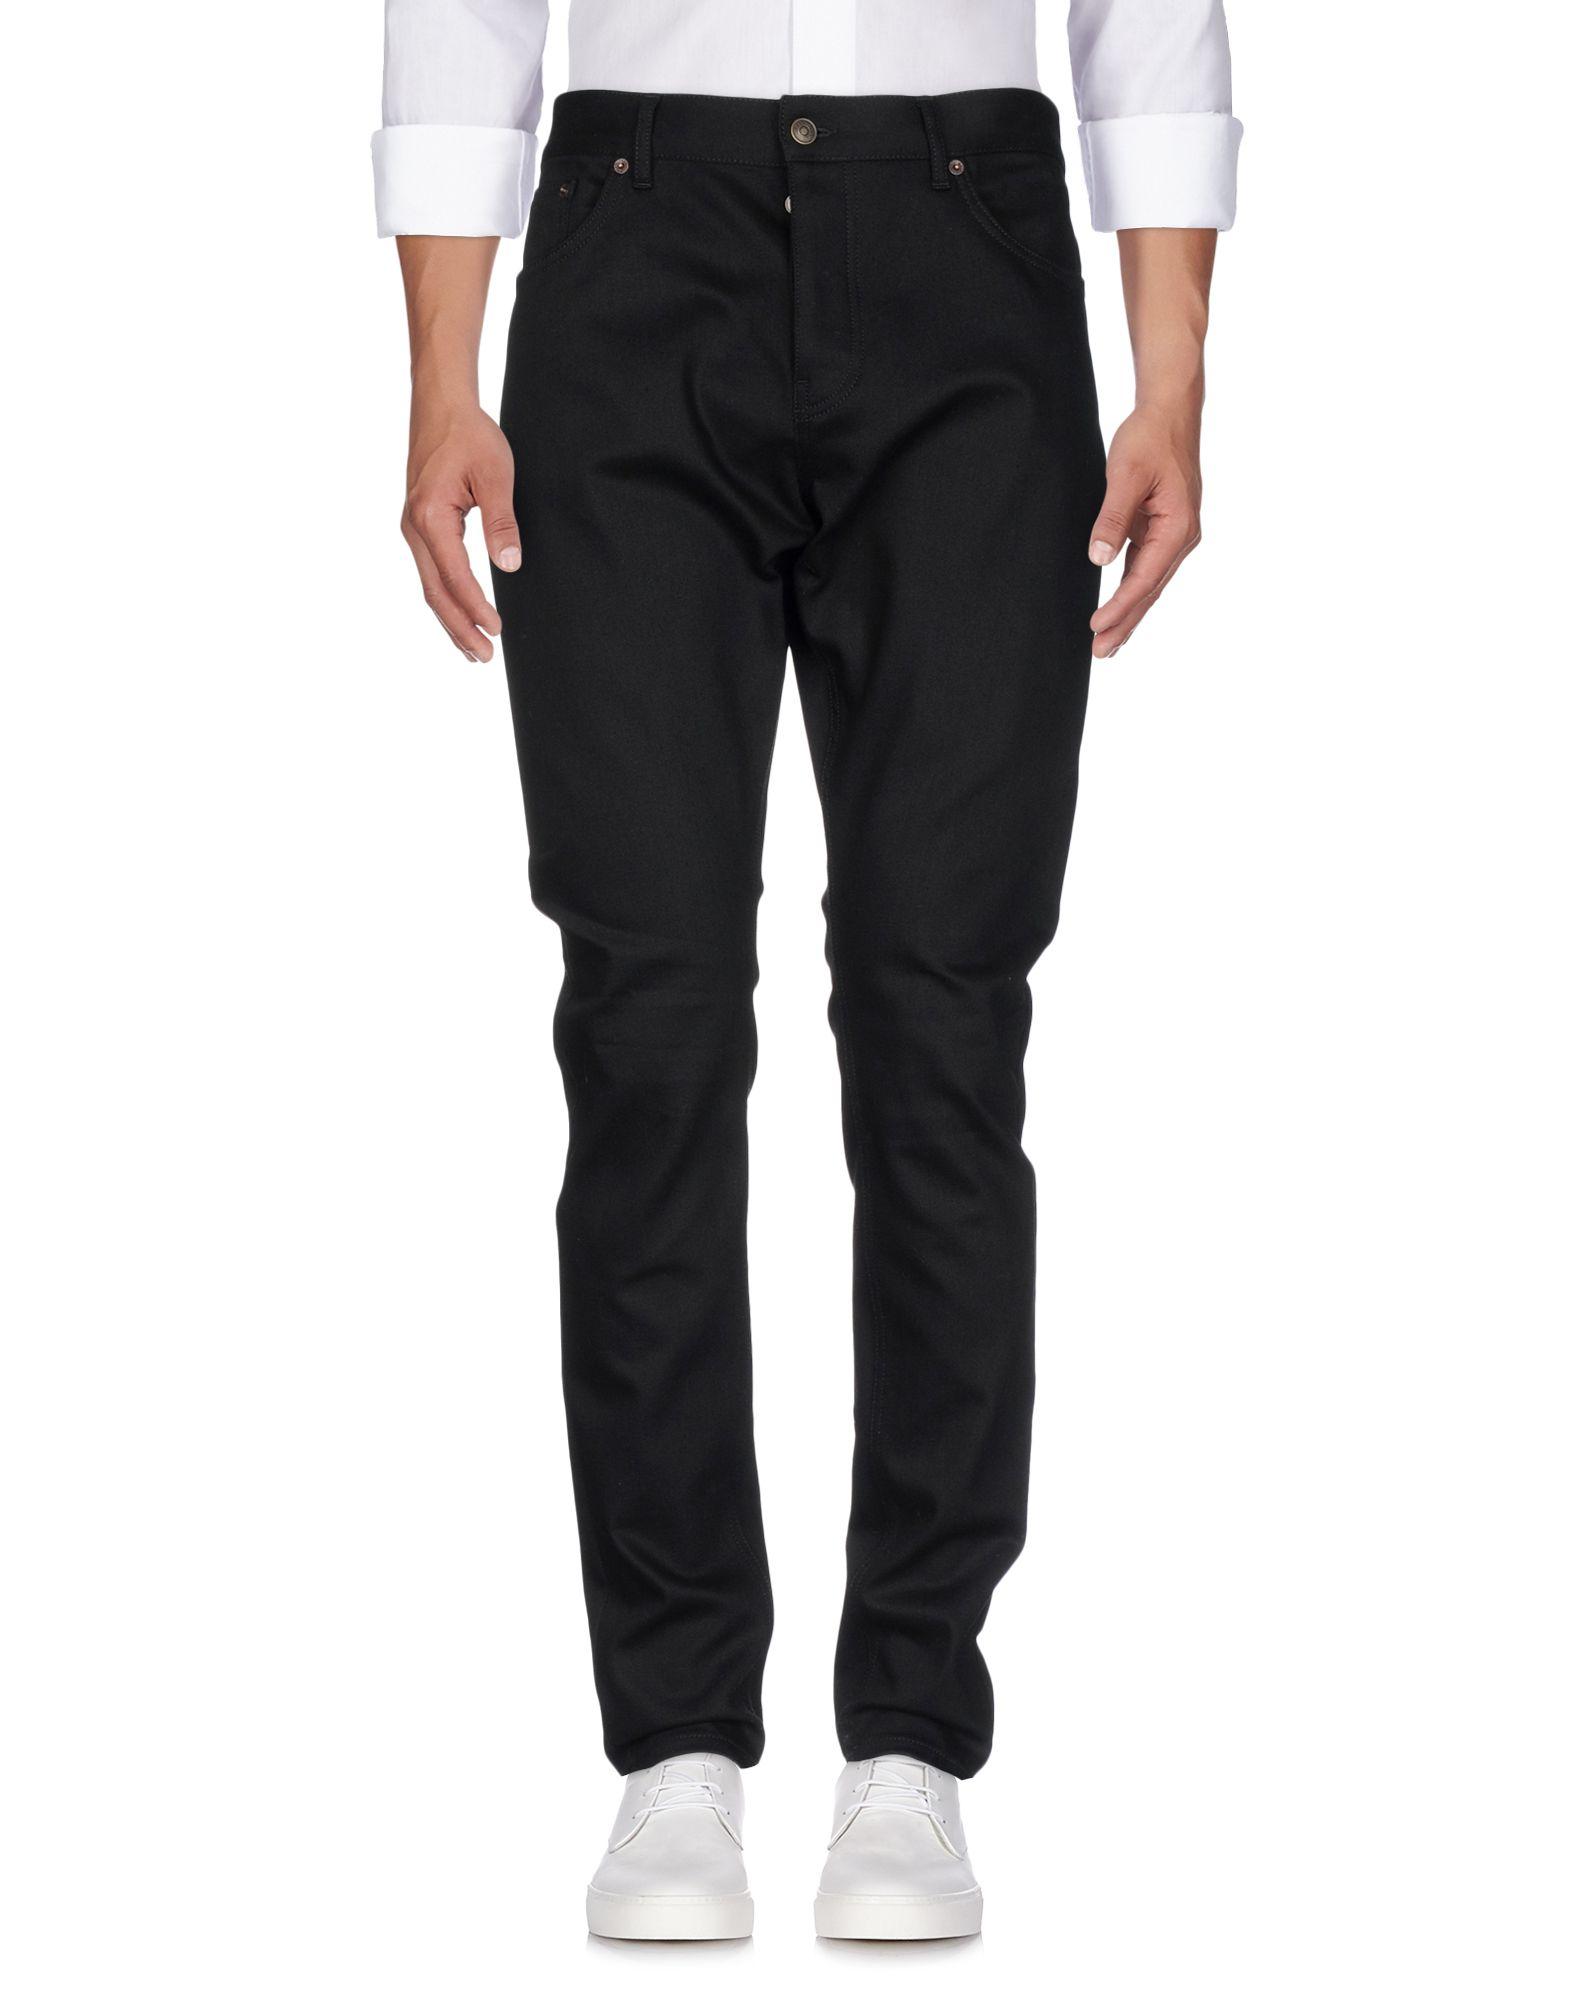 Pantaloni Jeans Balenciaga Uomo - Acquista online su